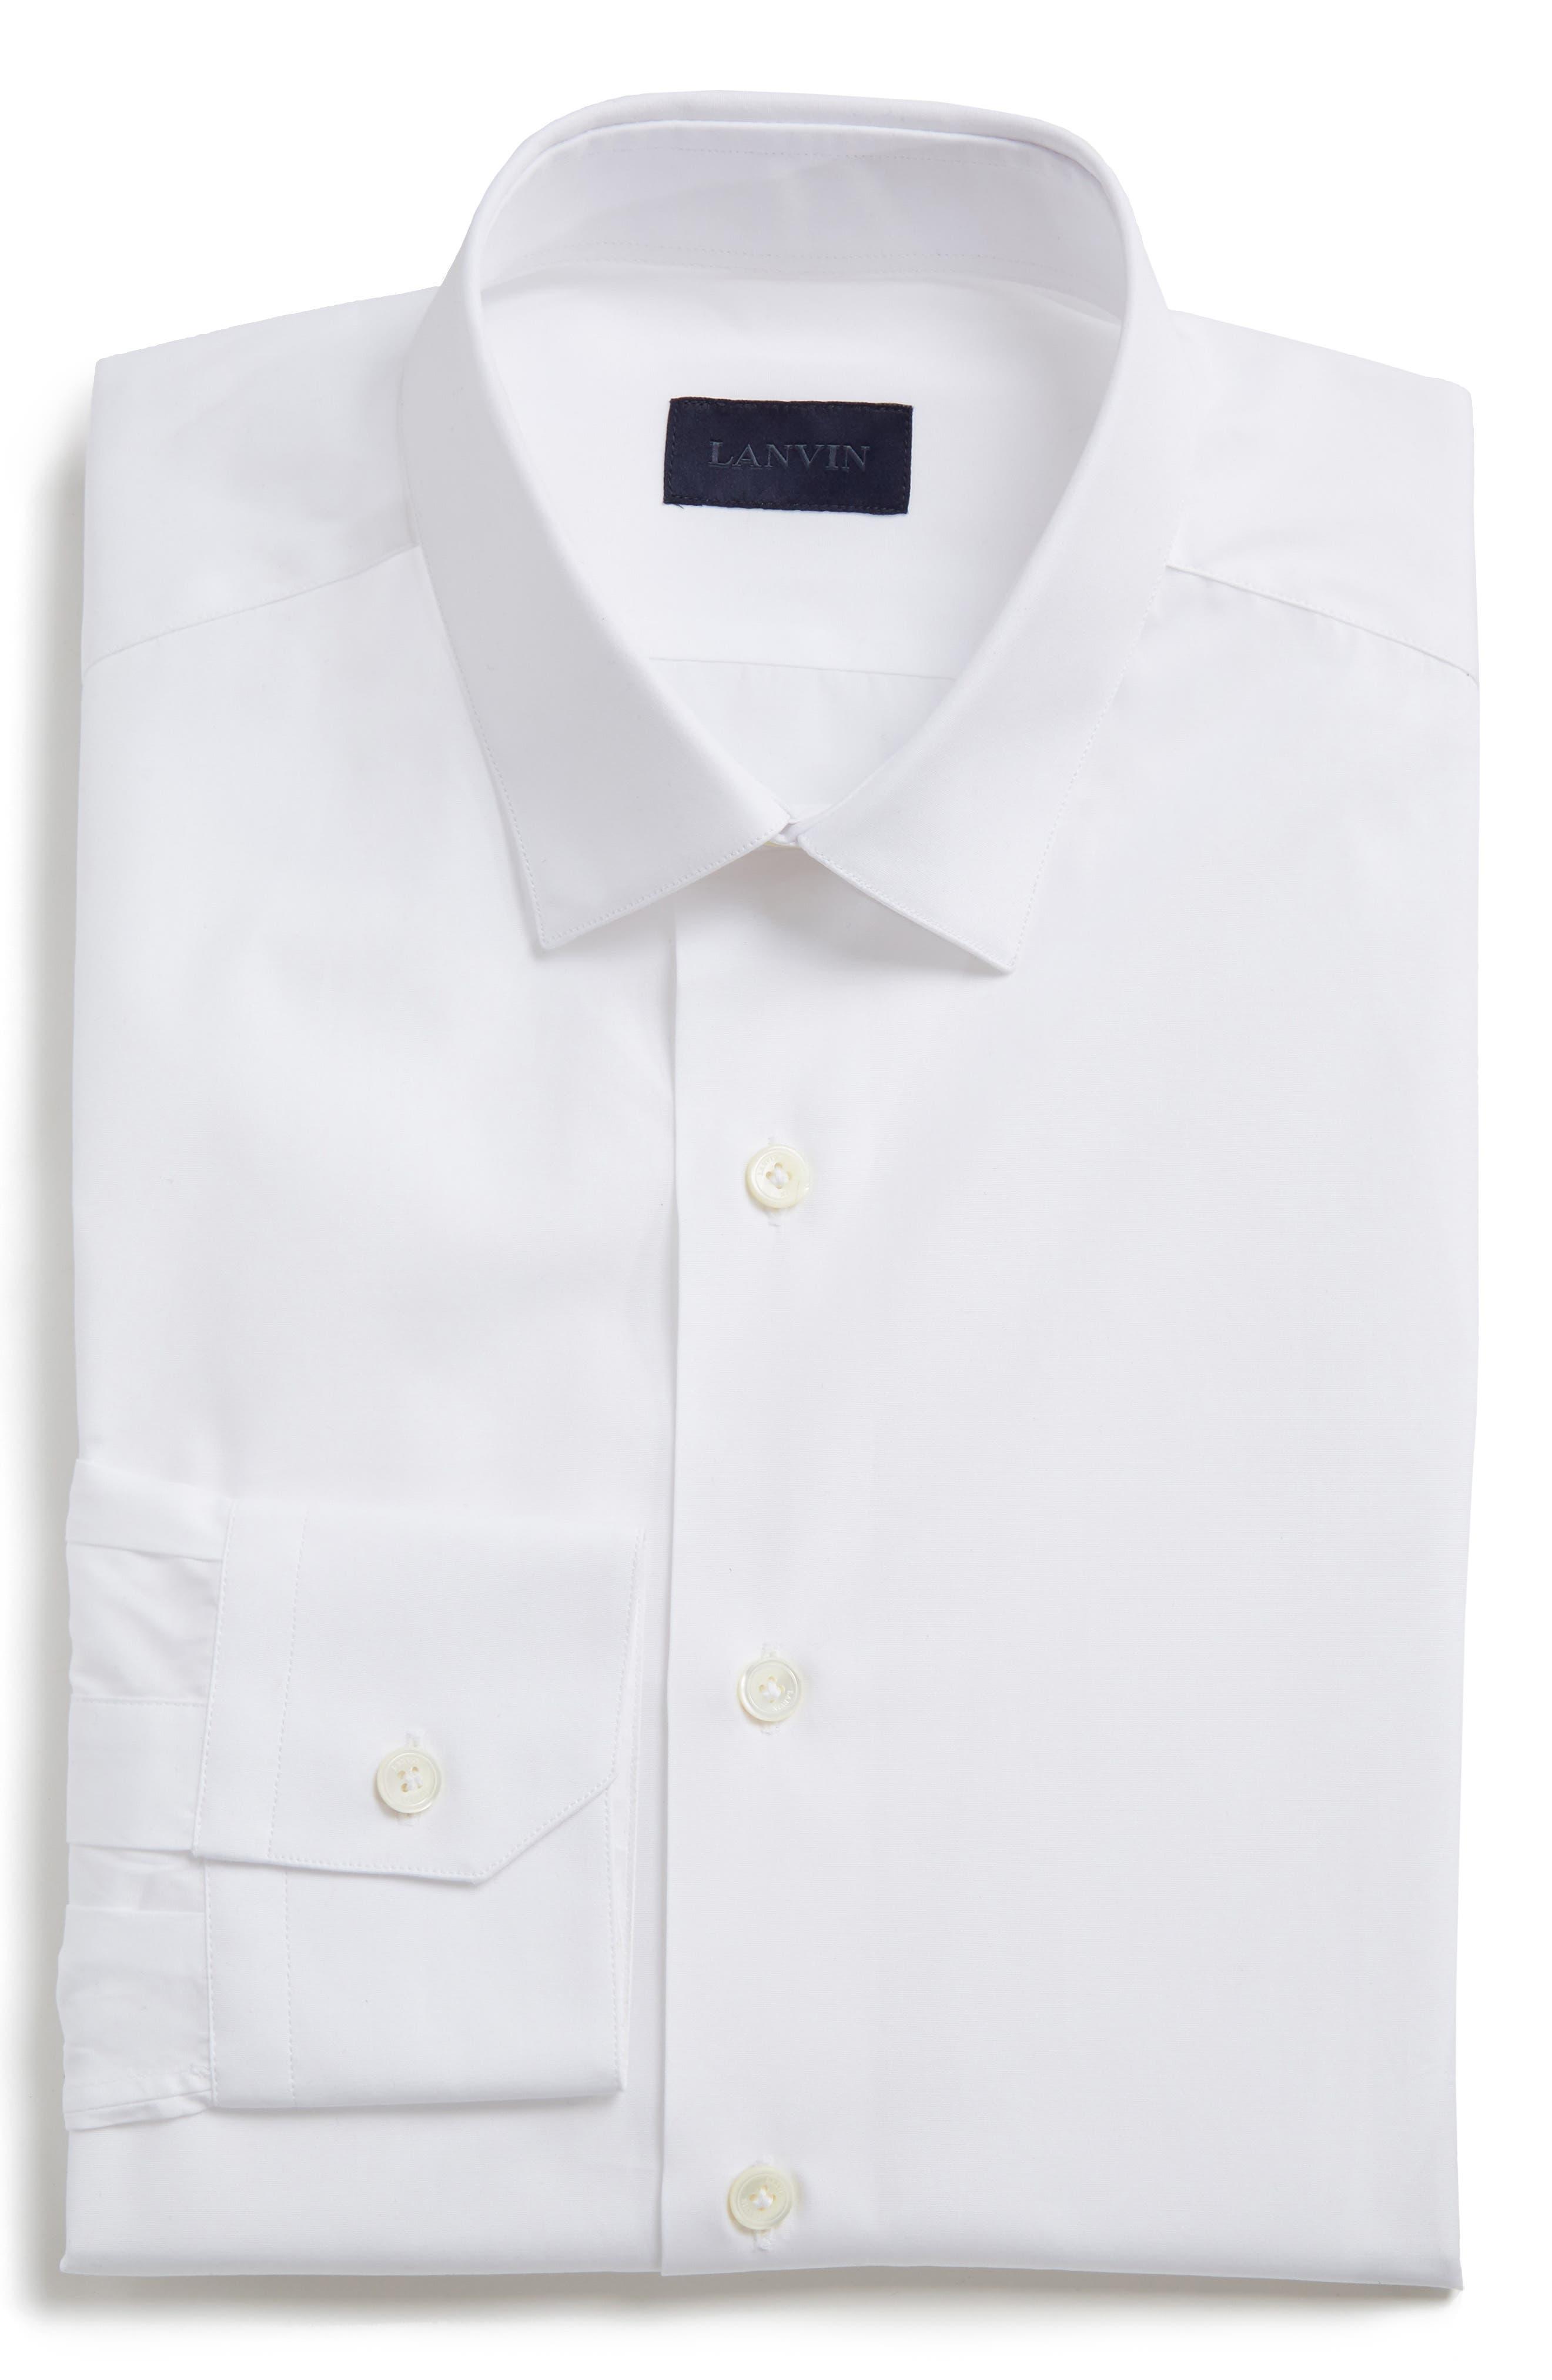 Extra Trim Fit Cotton Dress Shirt,                         Main,                         color, White